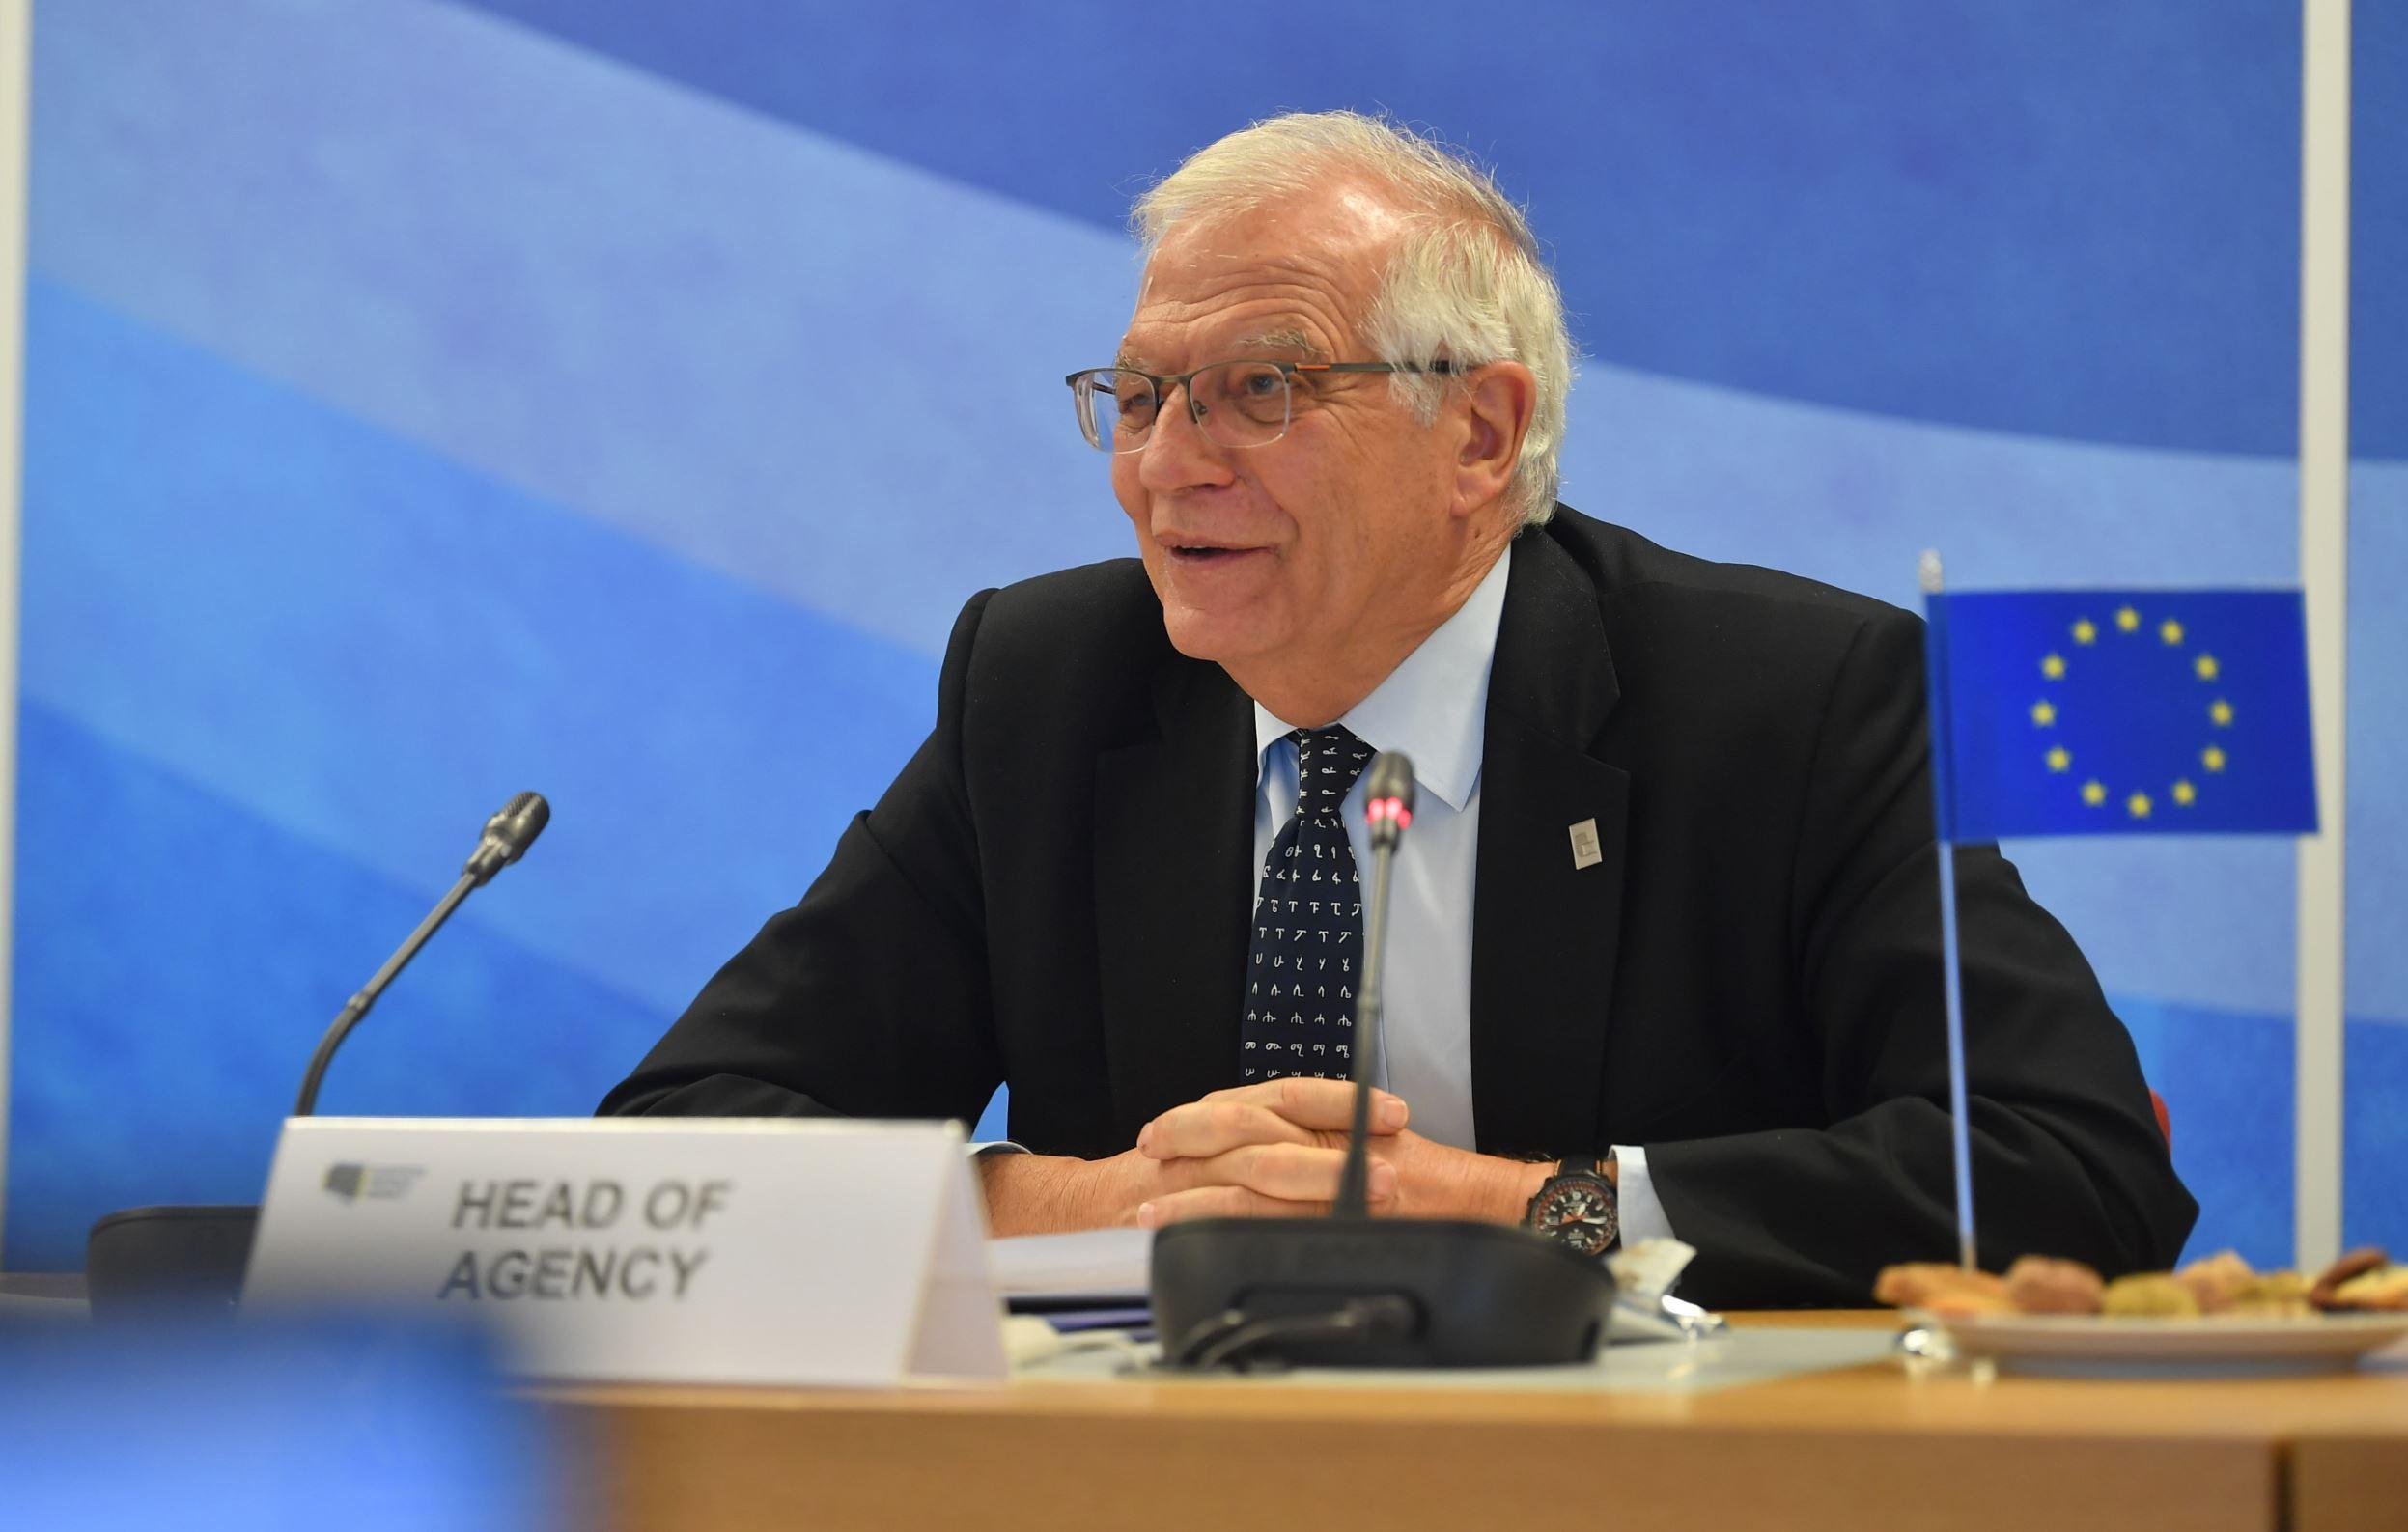 HRVP Josep Borrell visits the European Defence Agency